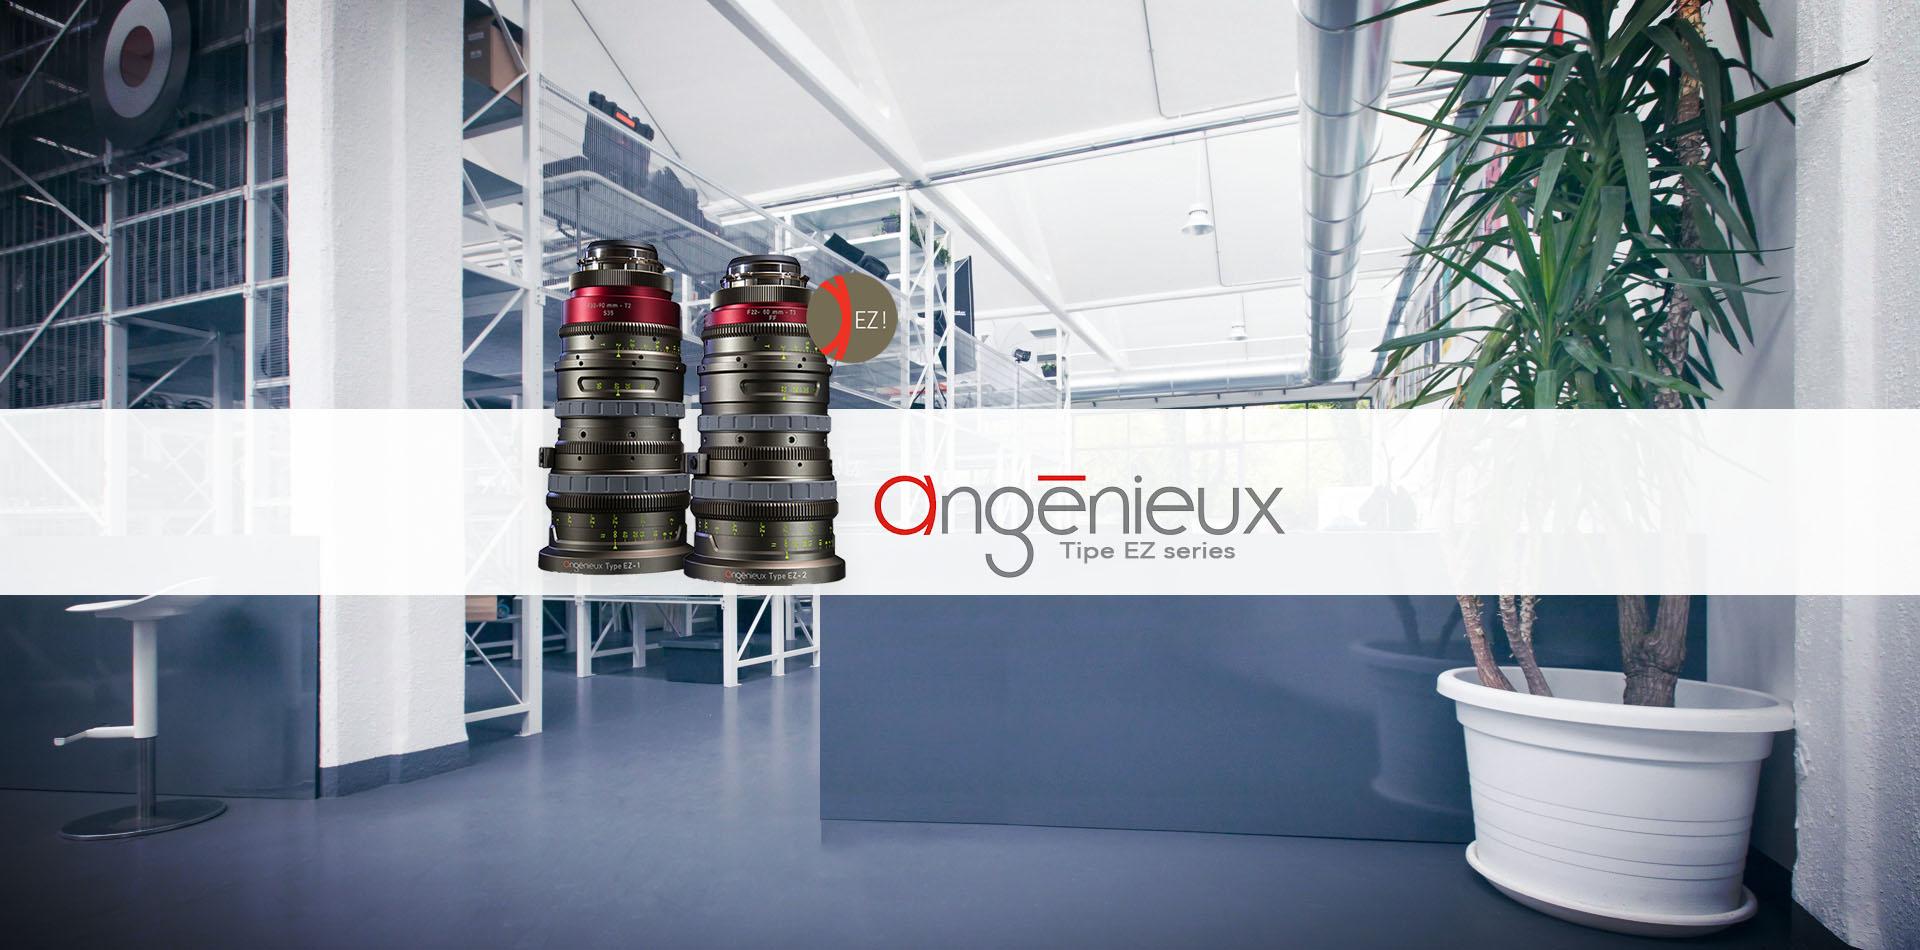 angenieux_homepage